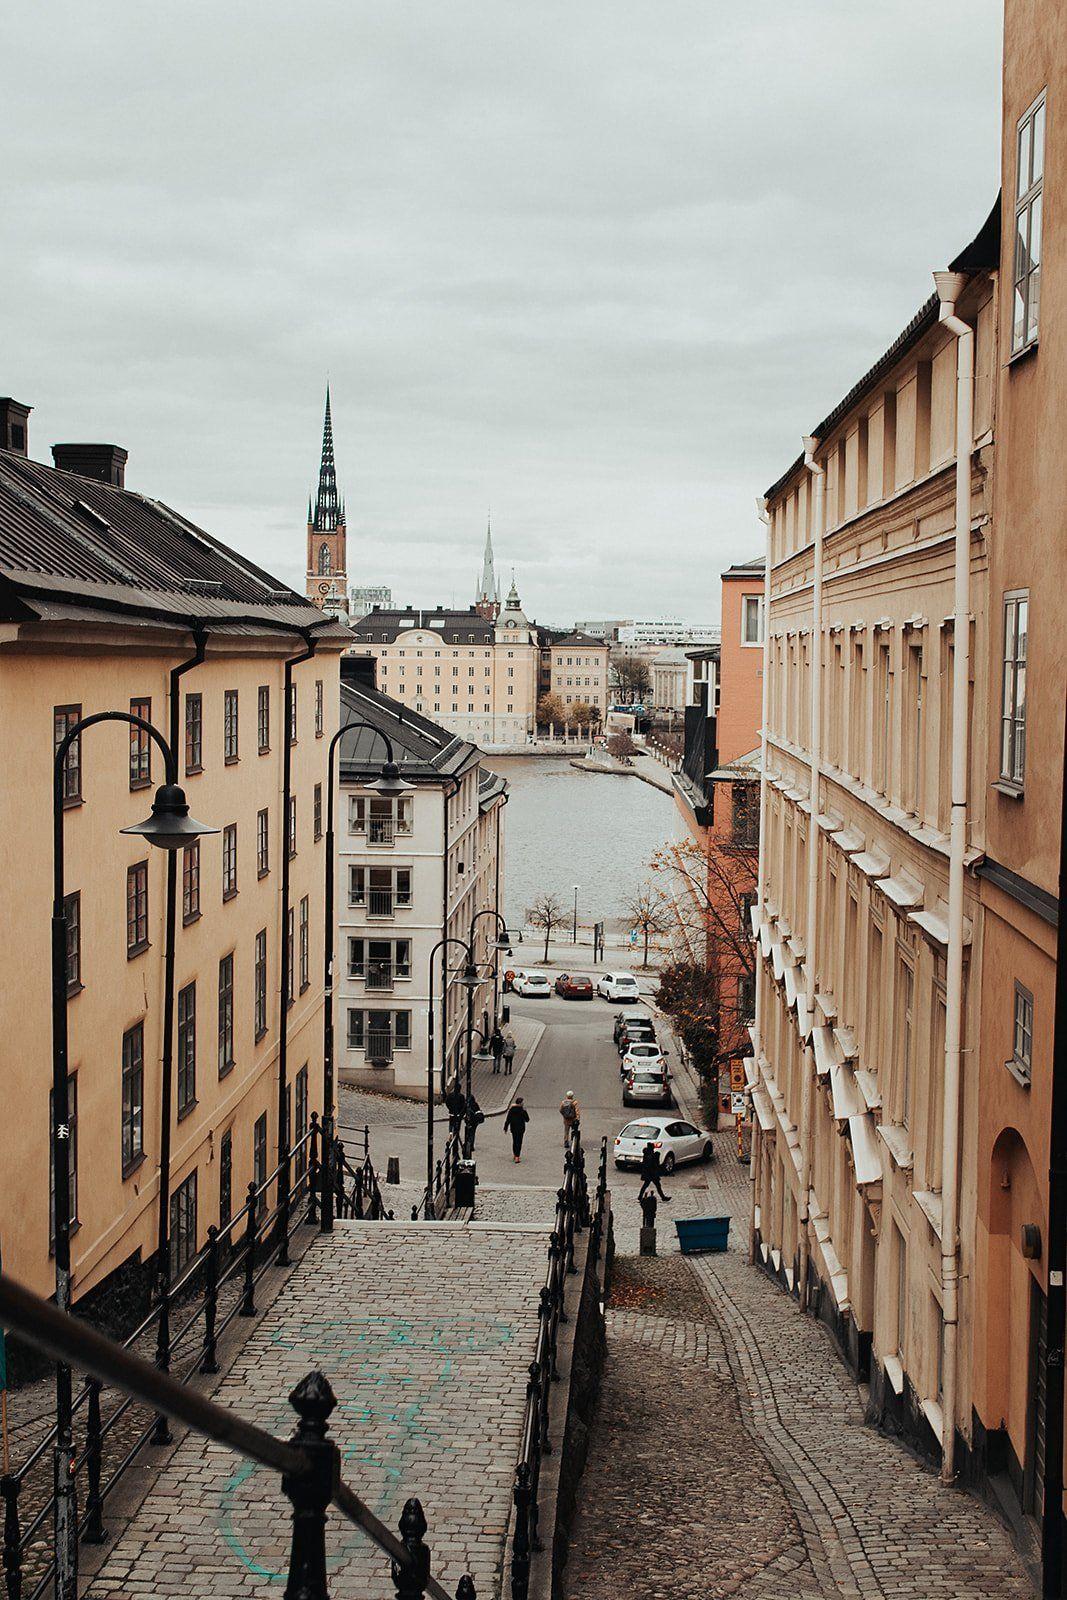 Instagrammable Guide to Stockholm | Stockholm Instagram Guide